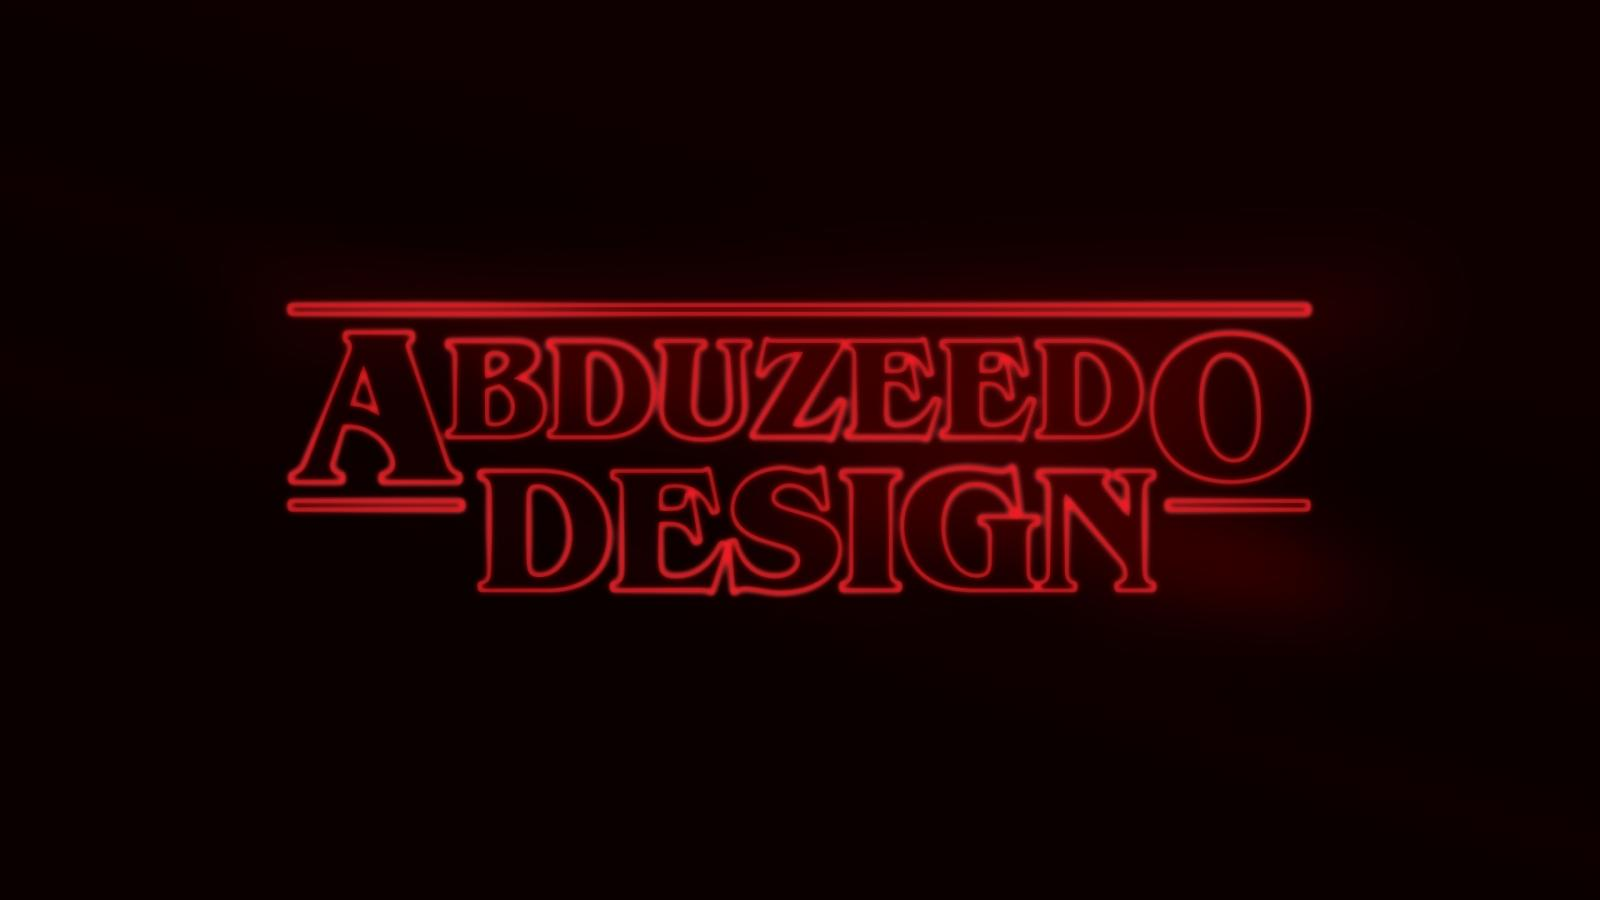 Tutorial abduzeedo stranger things logo photoshop tutorials baditri Images